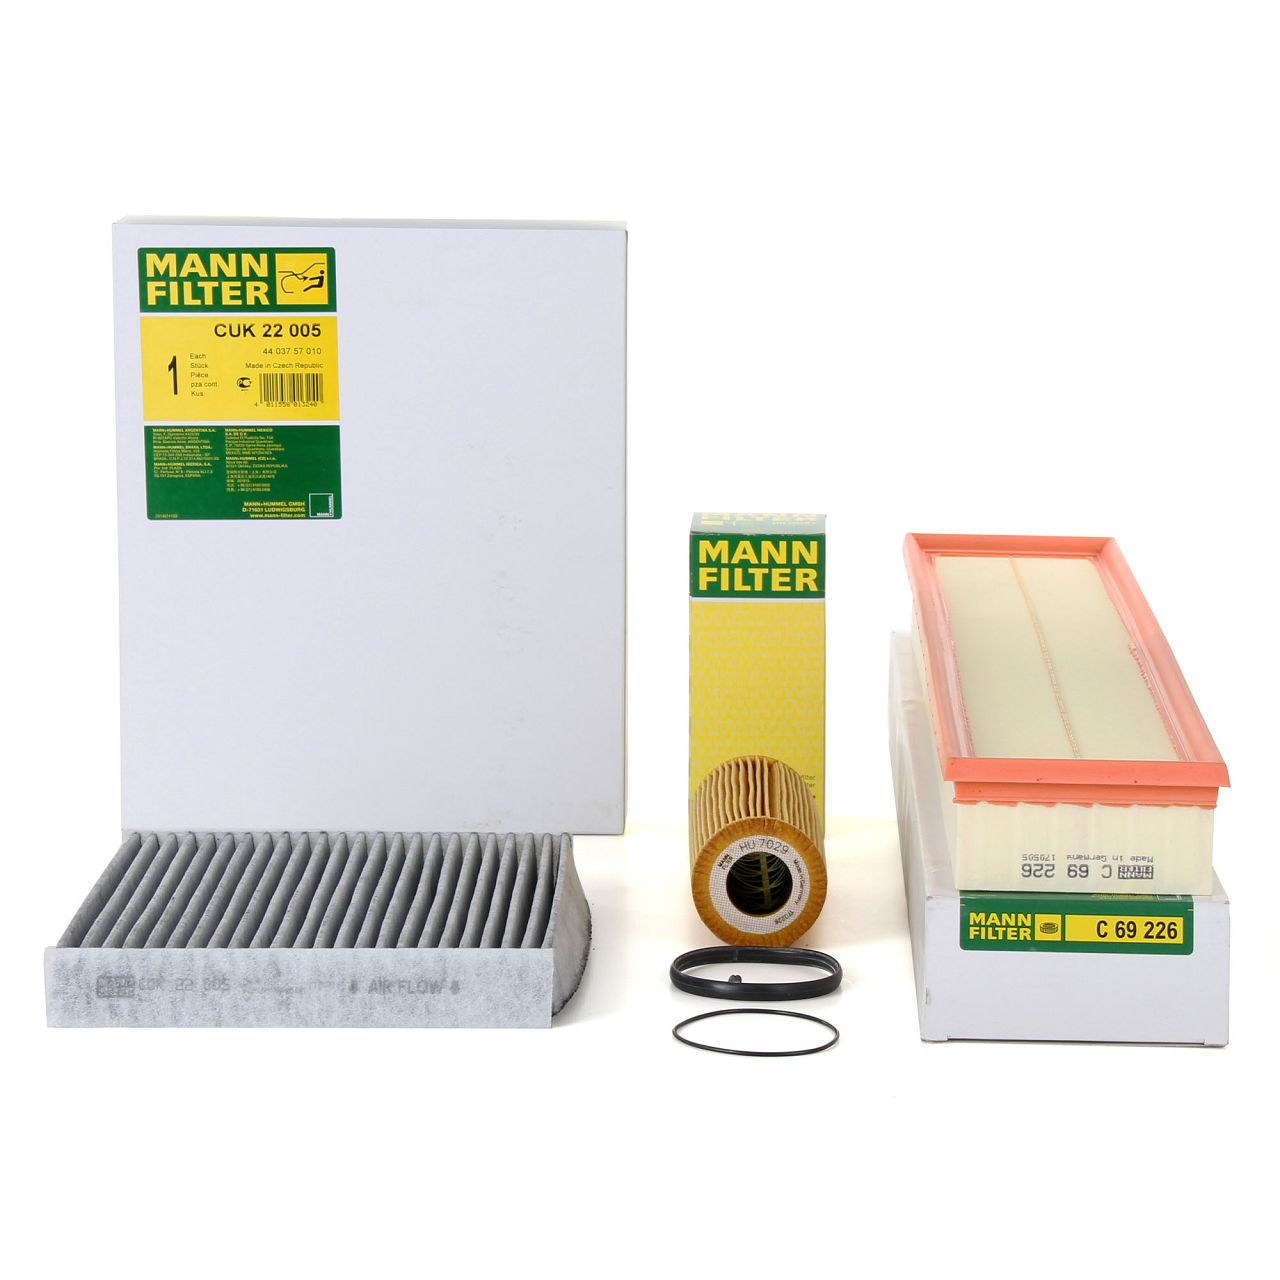 MANN Inspektionskit Filterpaket für PORSCHE PANAMERA (970) 3.0 S E-Hybrid 333 PS